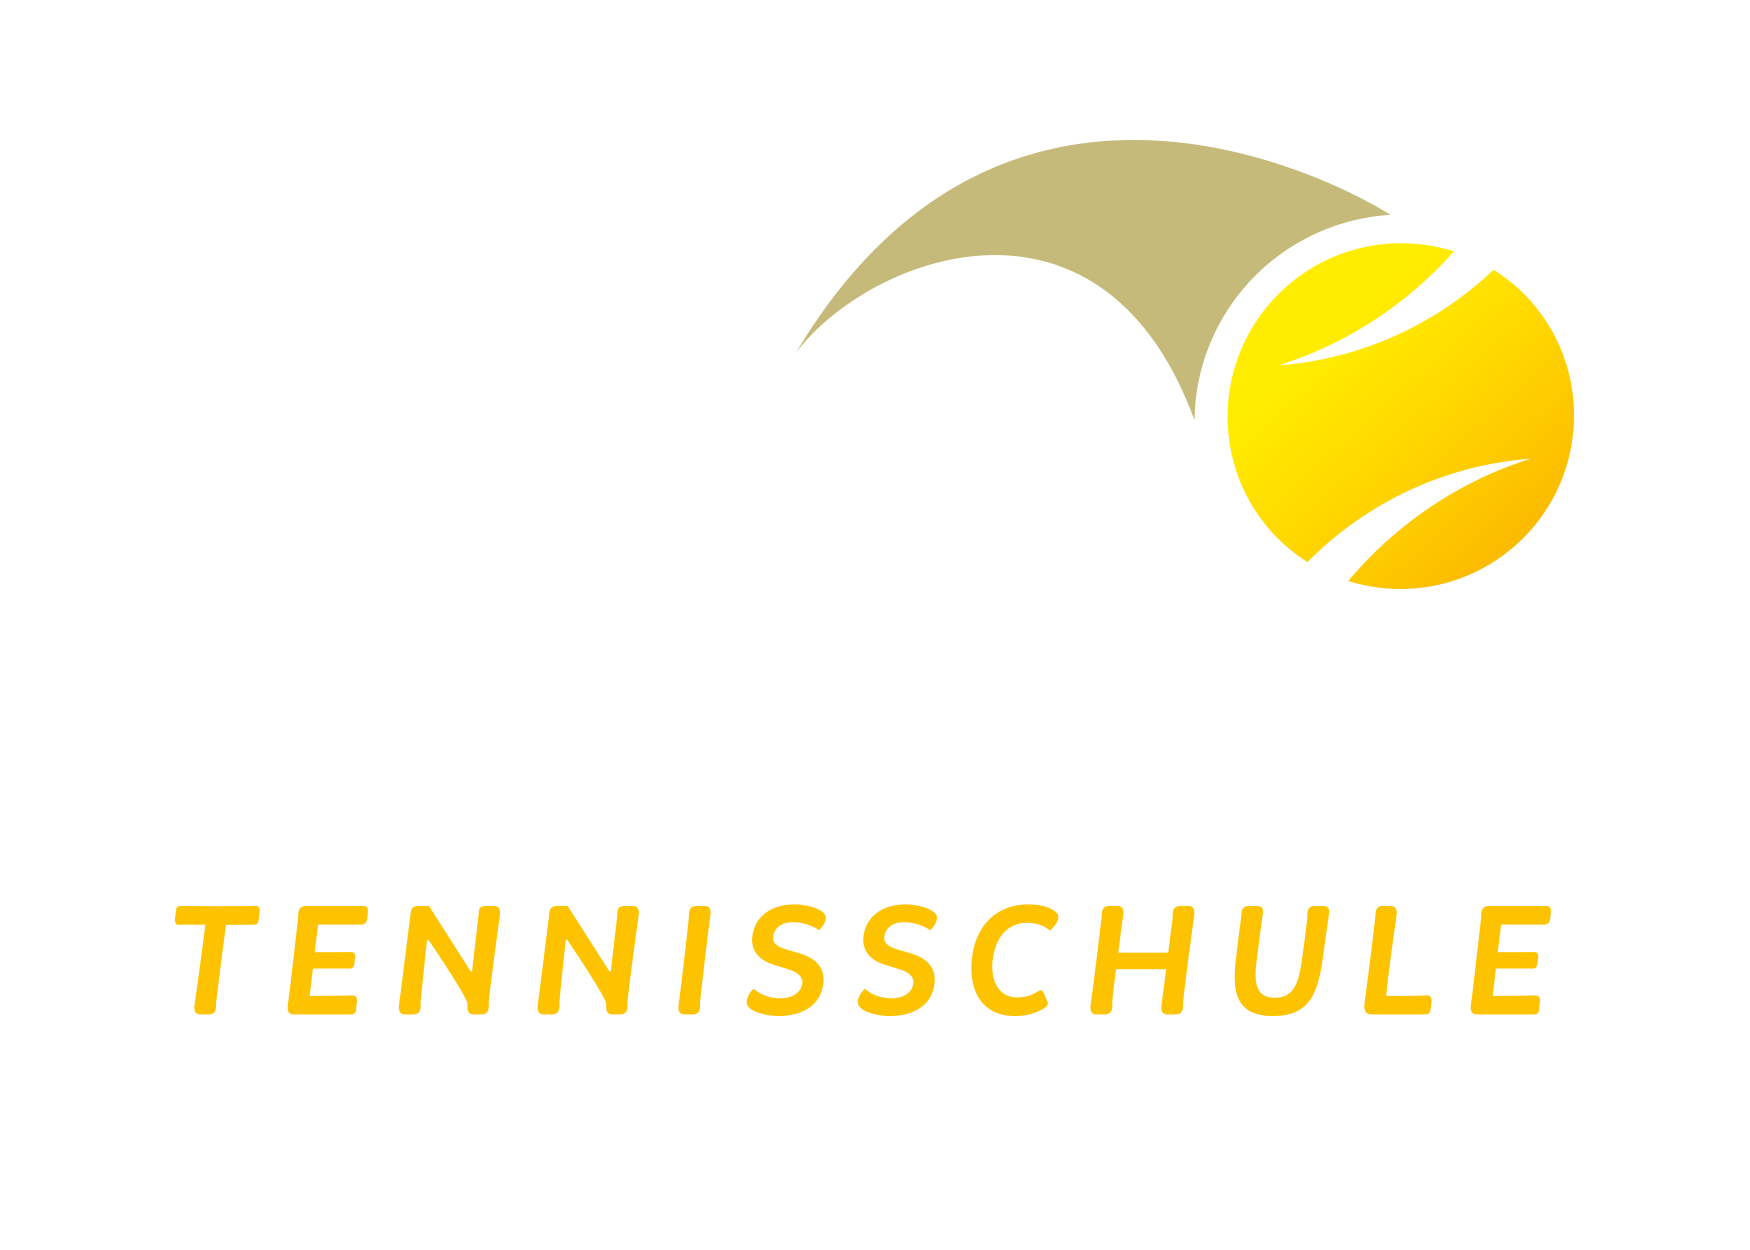 Tennisschule Raimund Knogler | Logo Werbeagentur Ritter